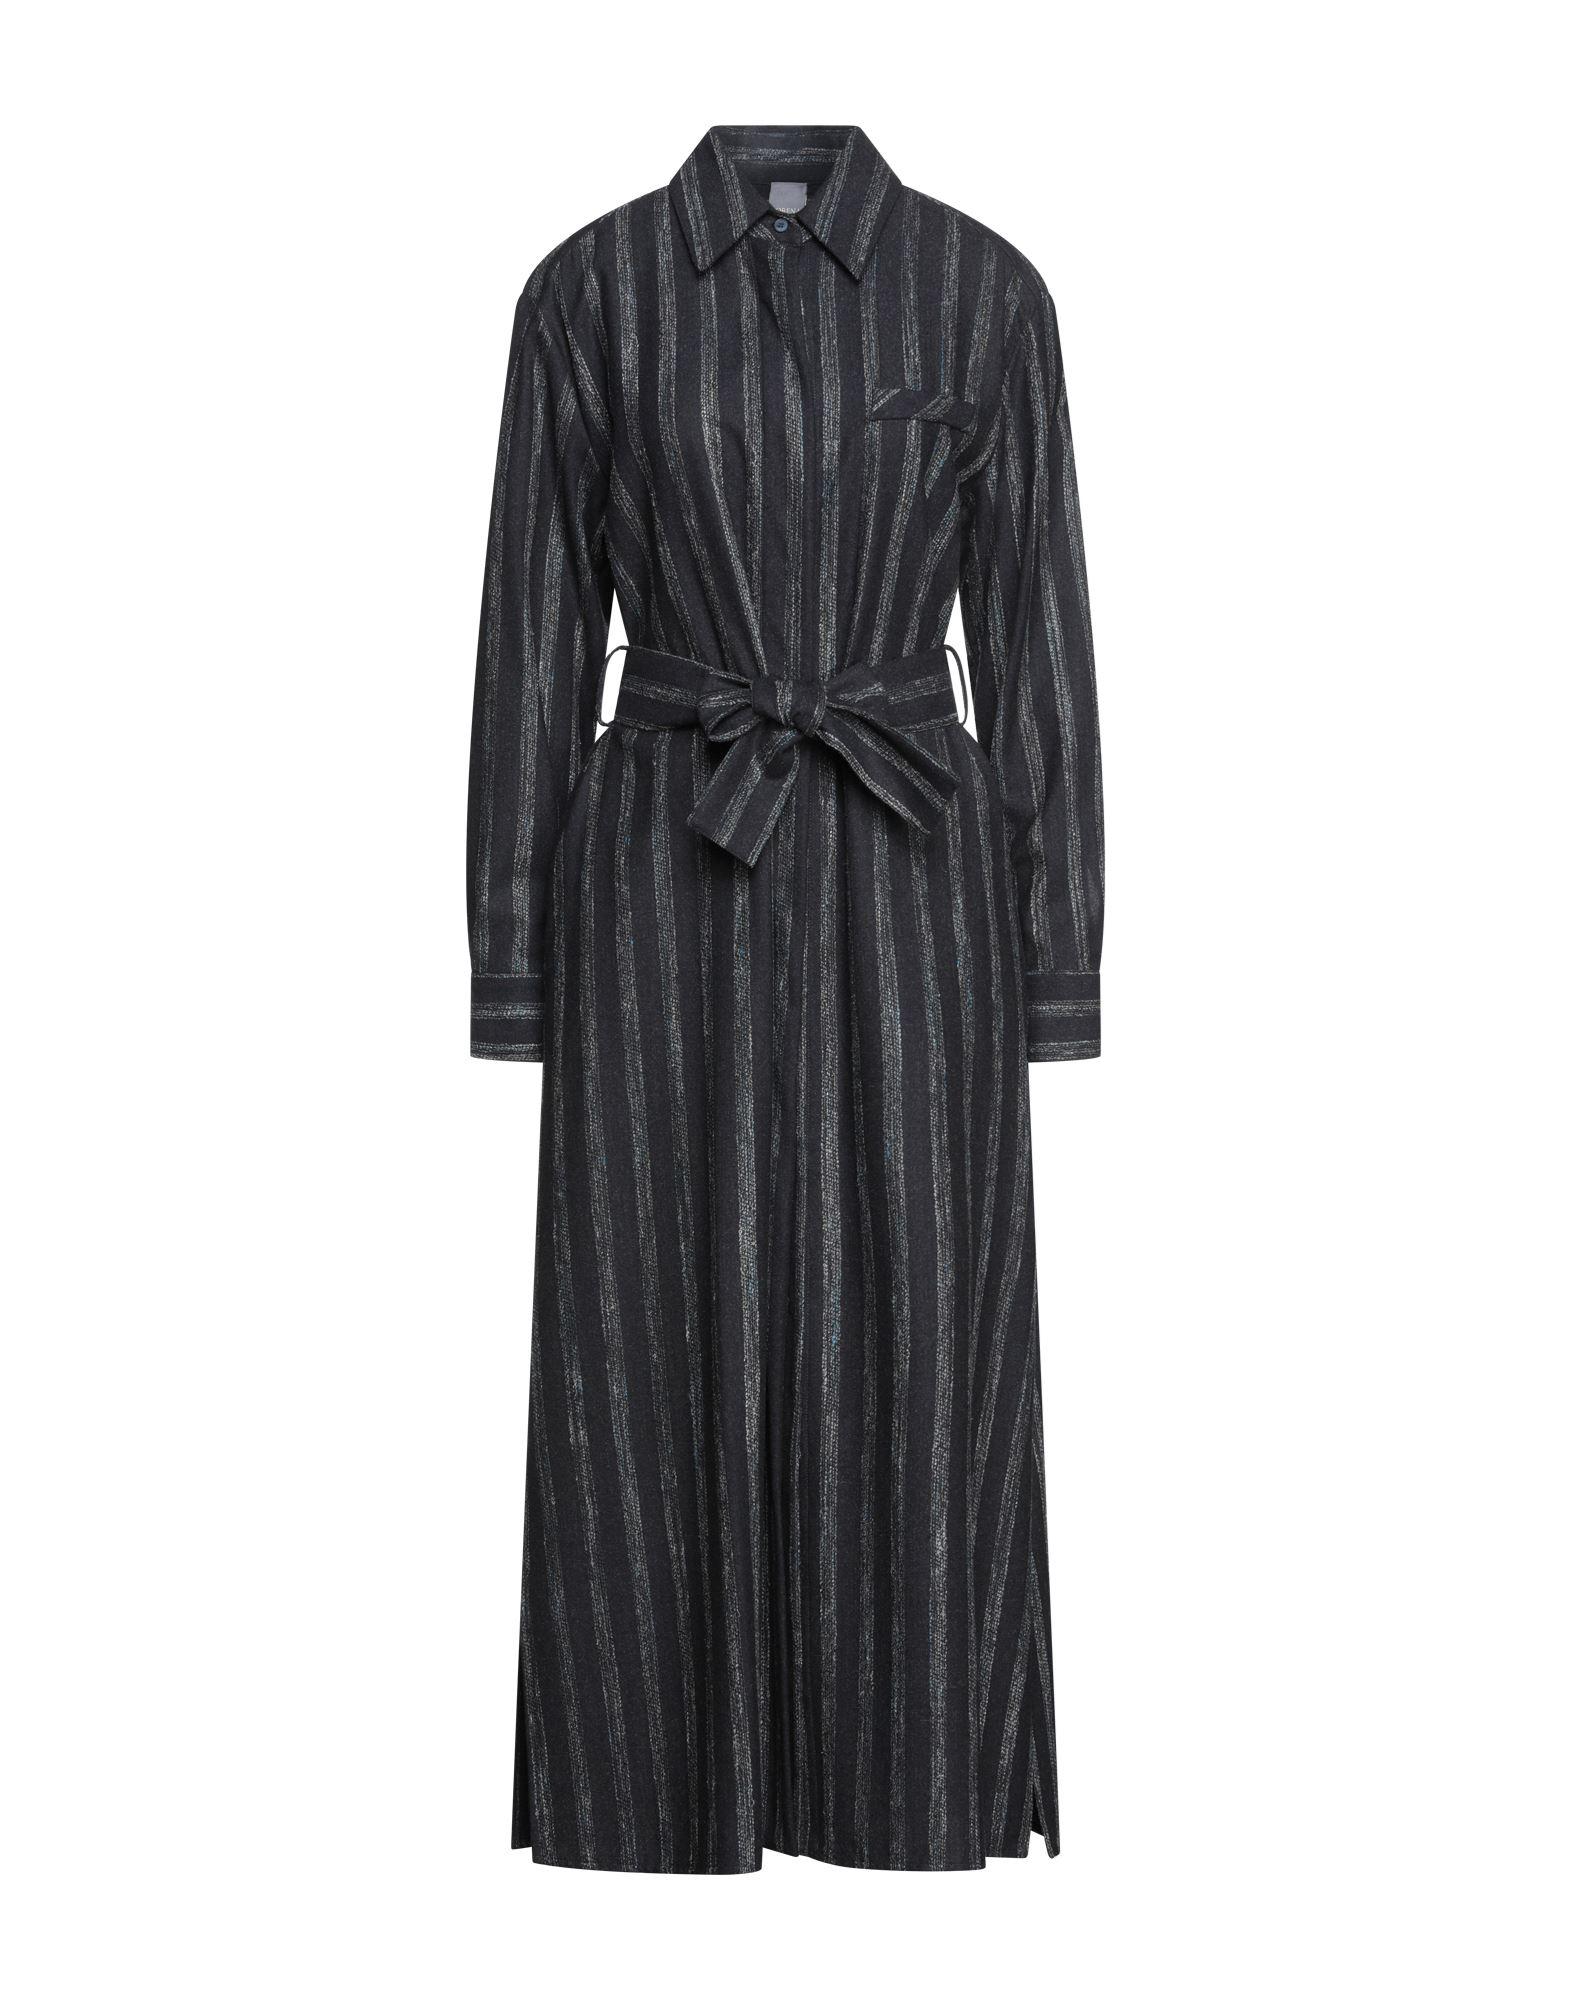 Lorena Antoniazzi Midi Dresses In Steel Grey